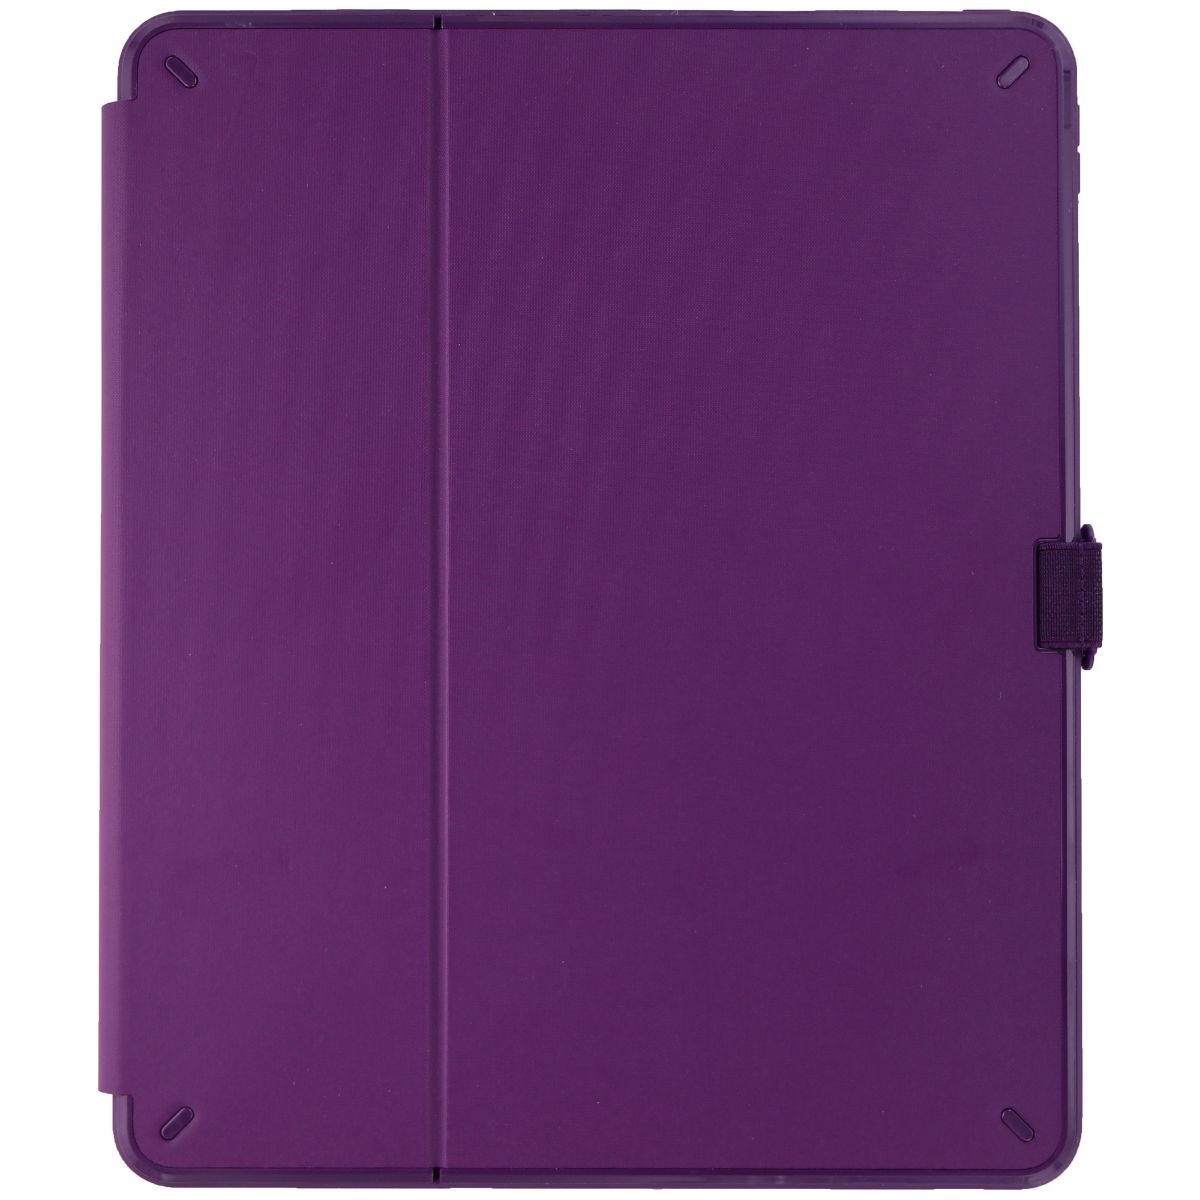 Speck Presidio Pro Series Folio Case for Apple iPad Pro 12.9 (2018) - Purple